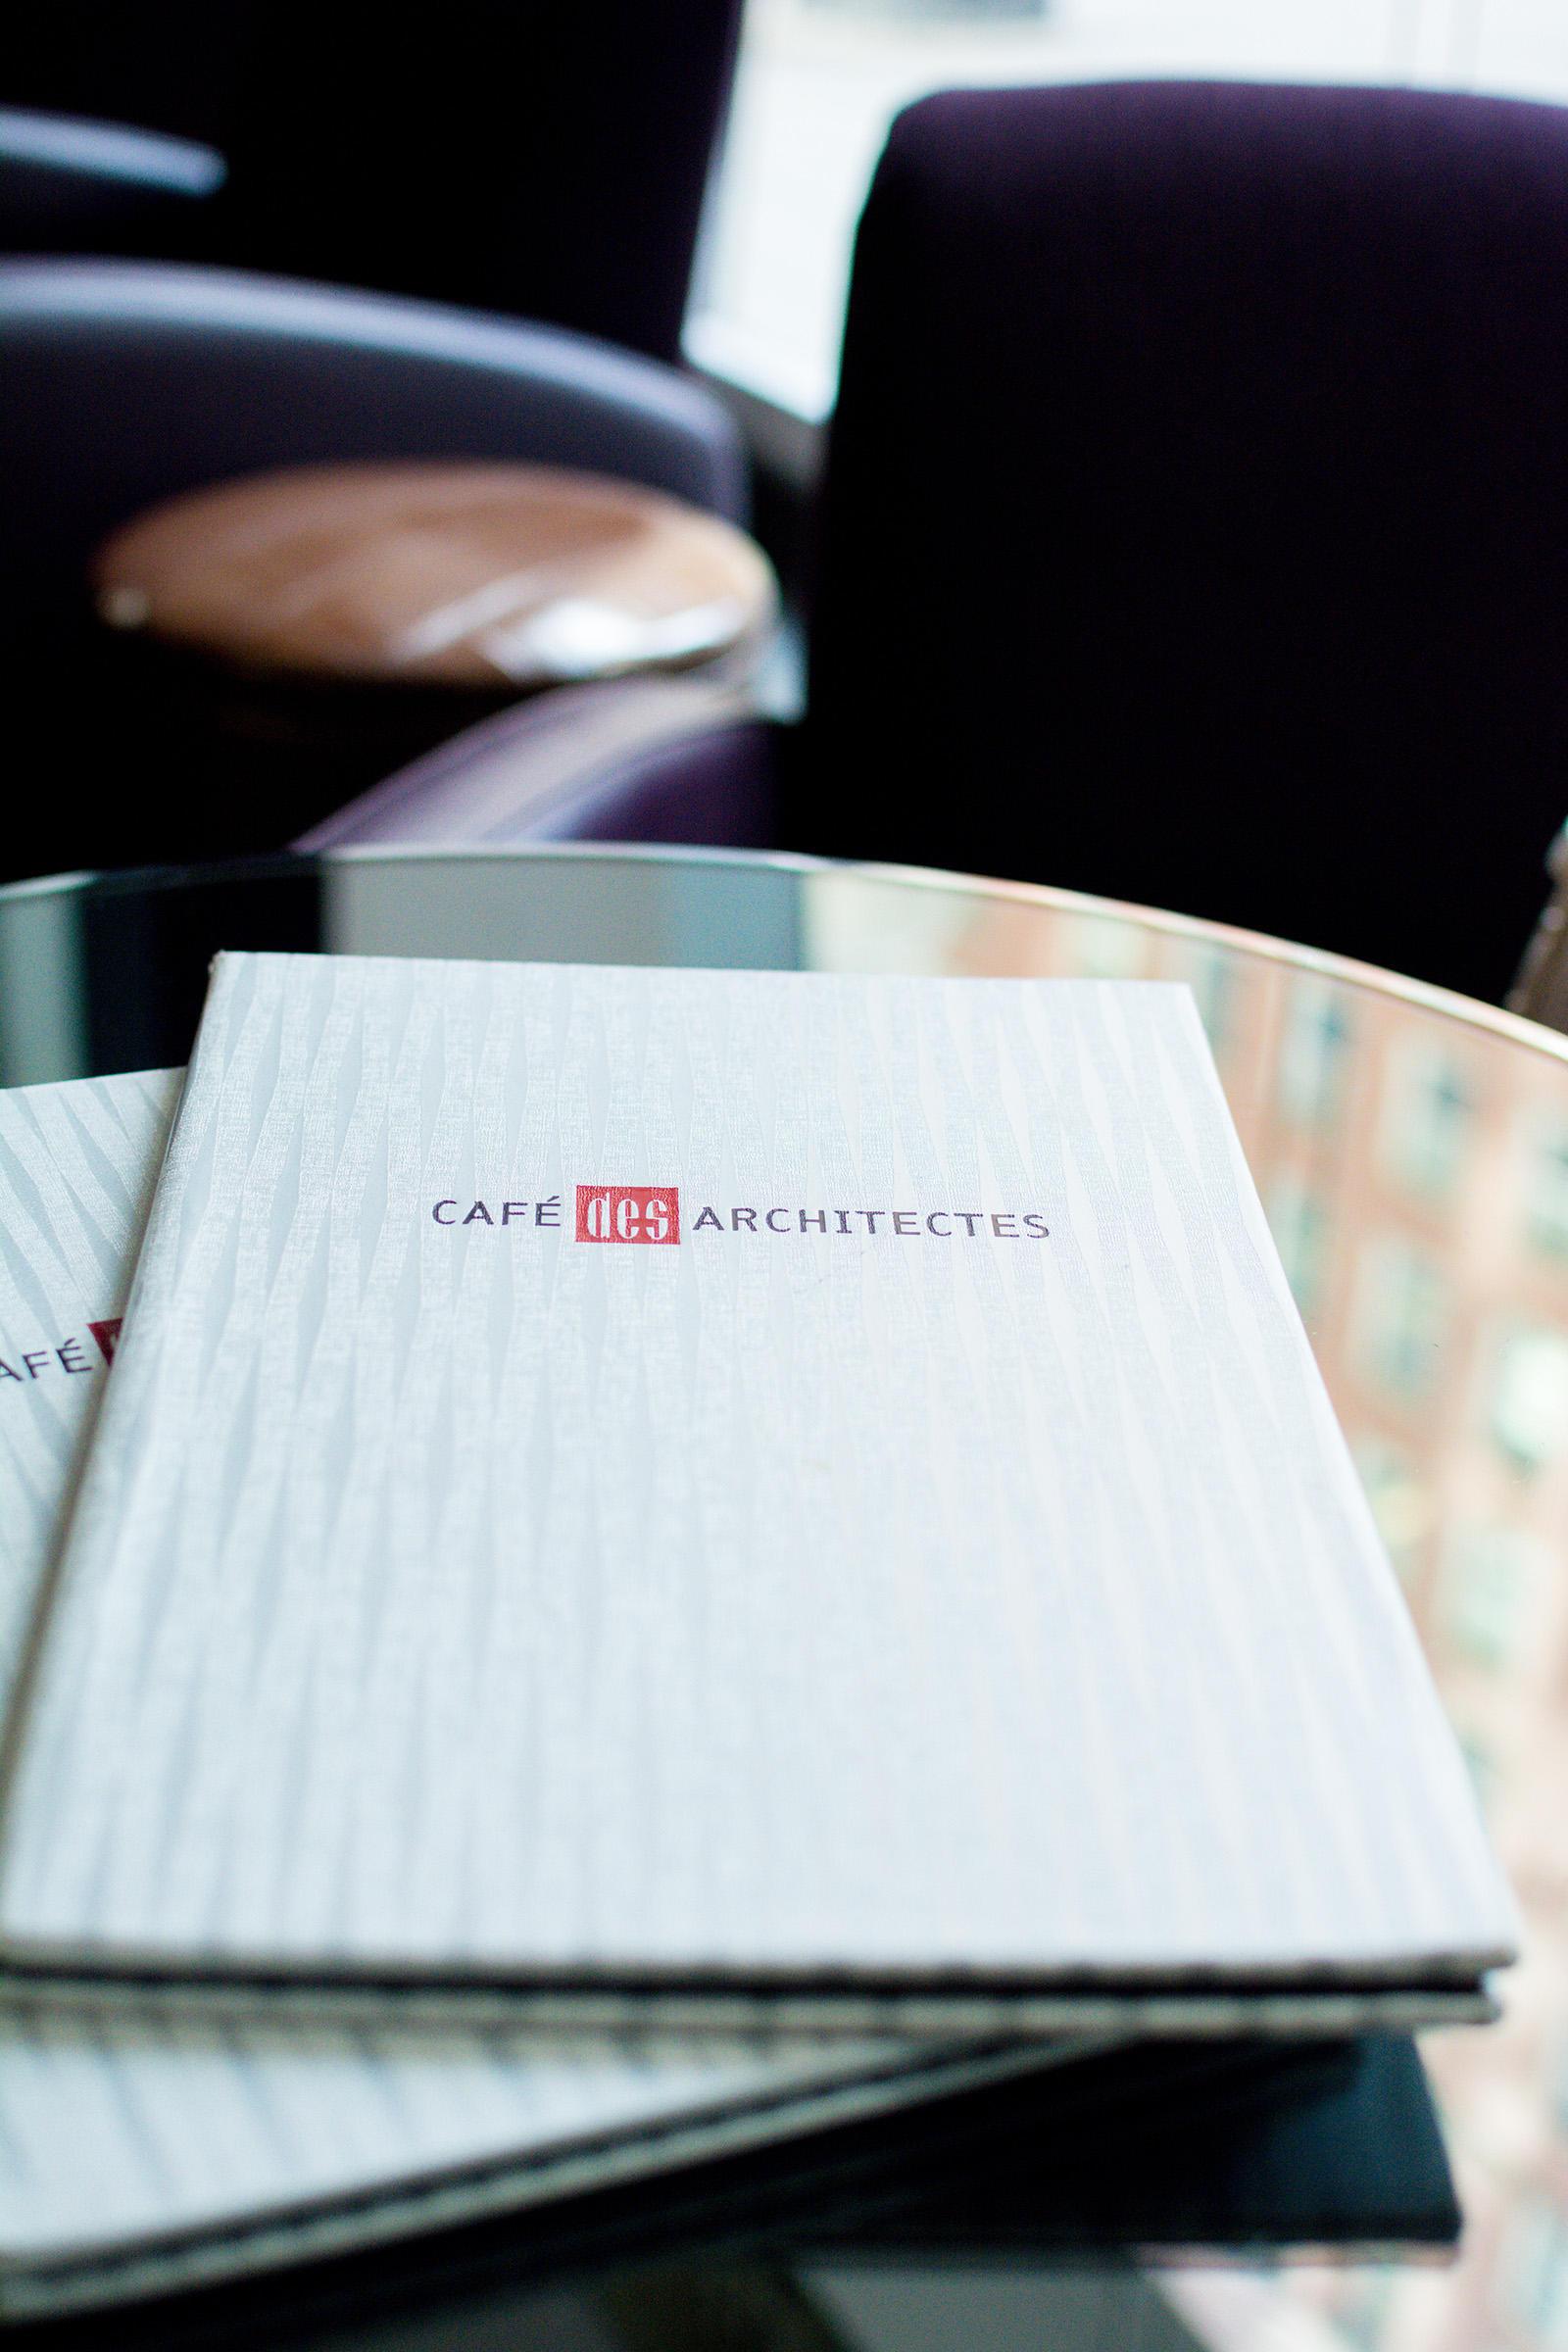 cafe des architectes sofitel chicago